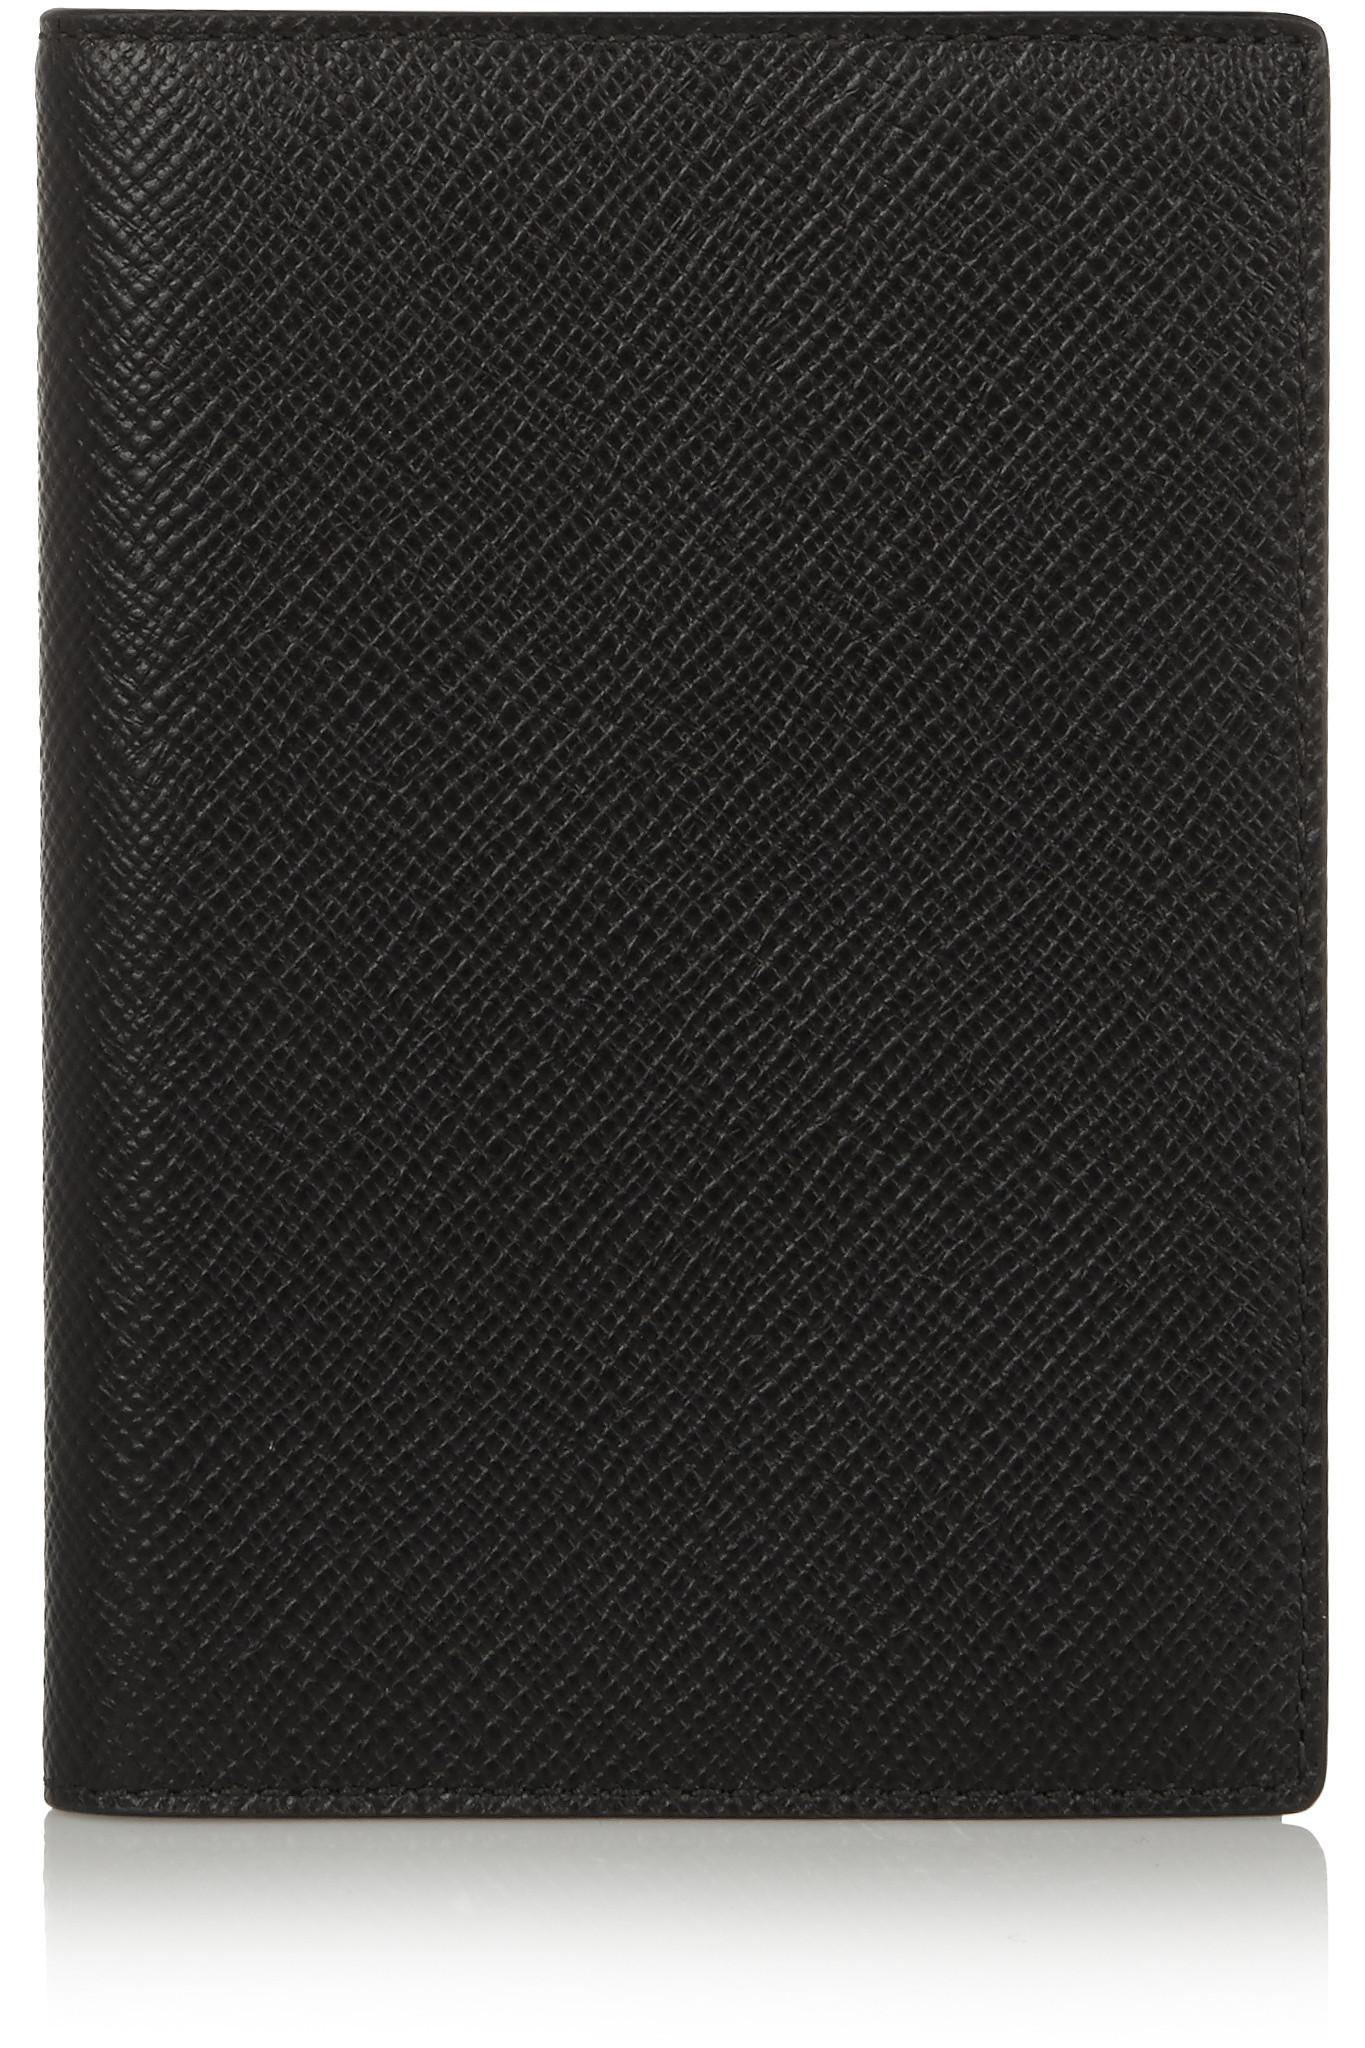 Textured-leather Passport Cover - Black Smythson haNUTQSC